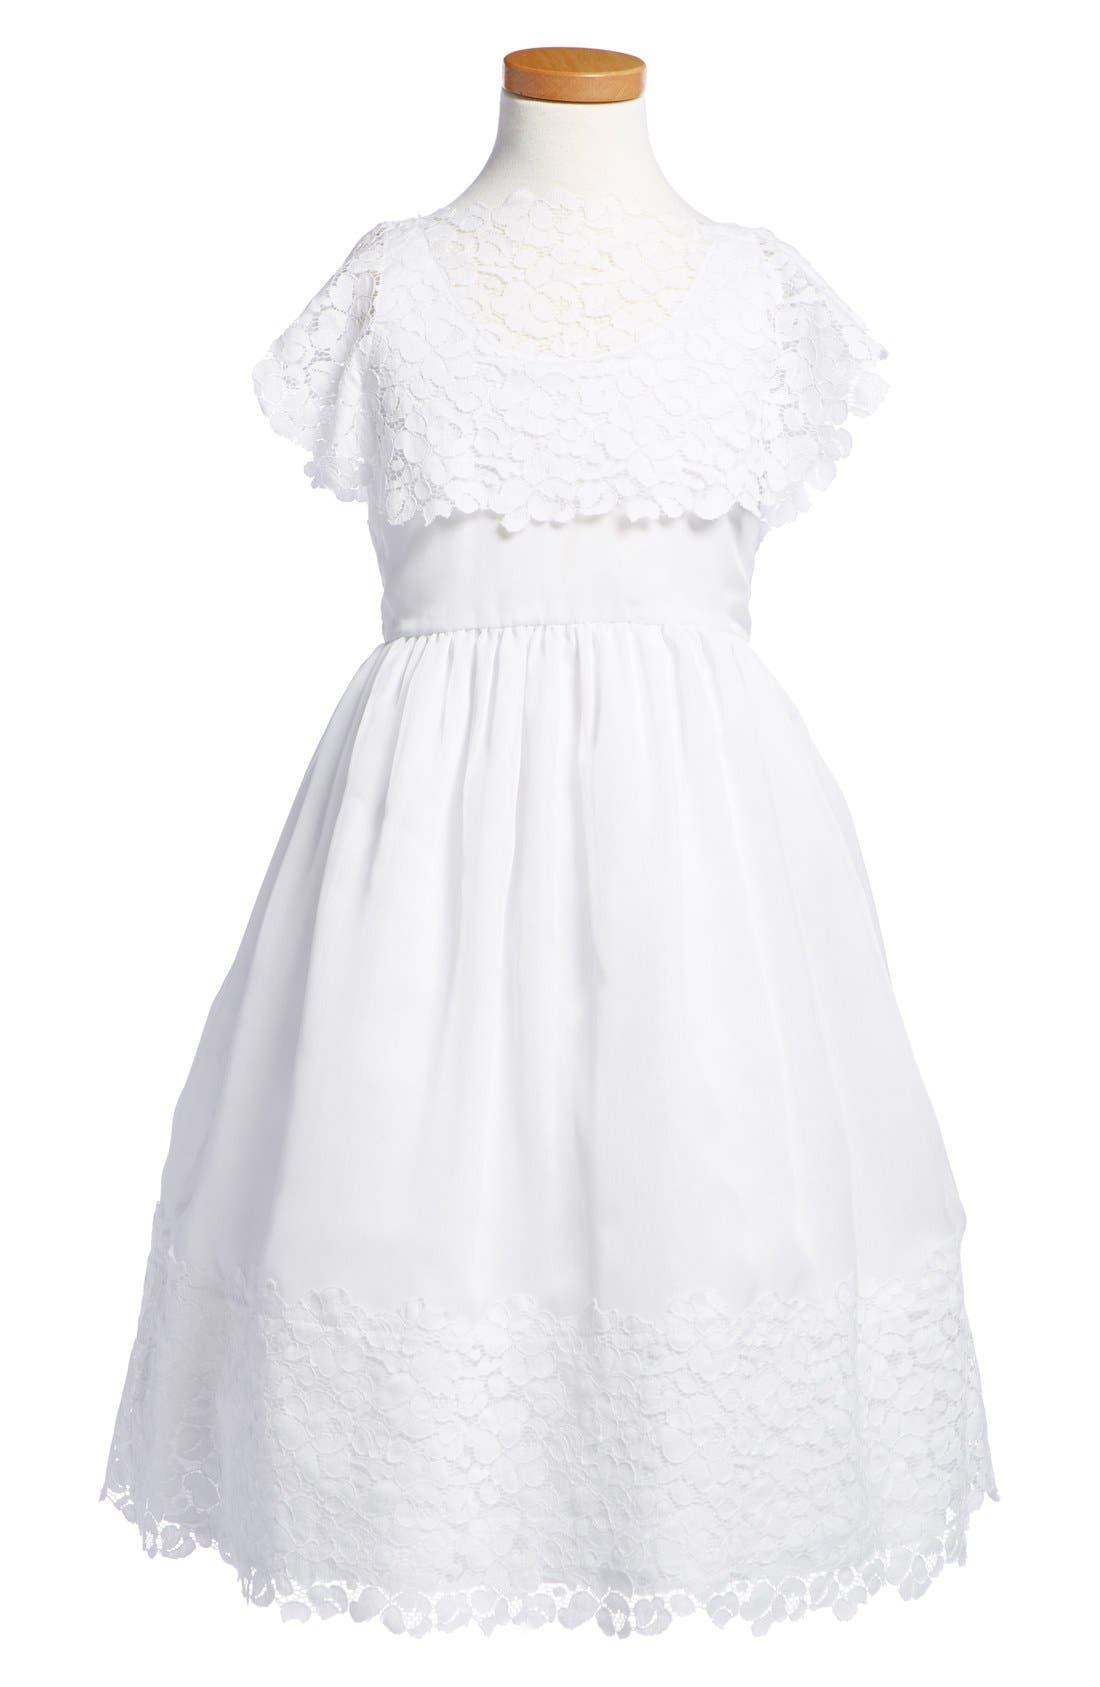 Main Image - Isabel Garreton Floral Lace Dress (Little Girls & Big Girls)